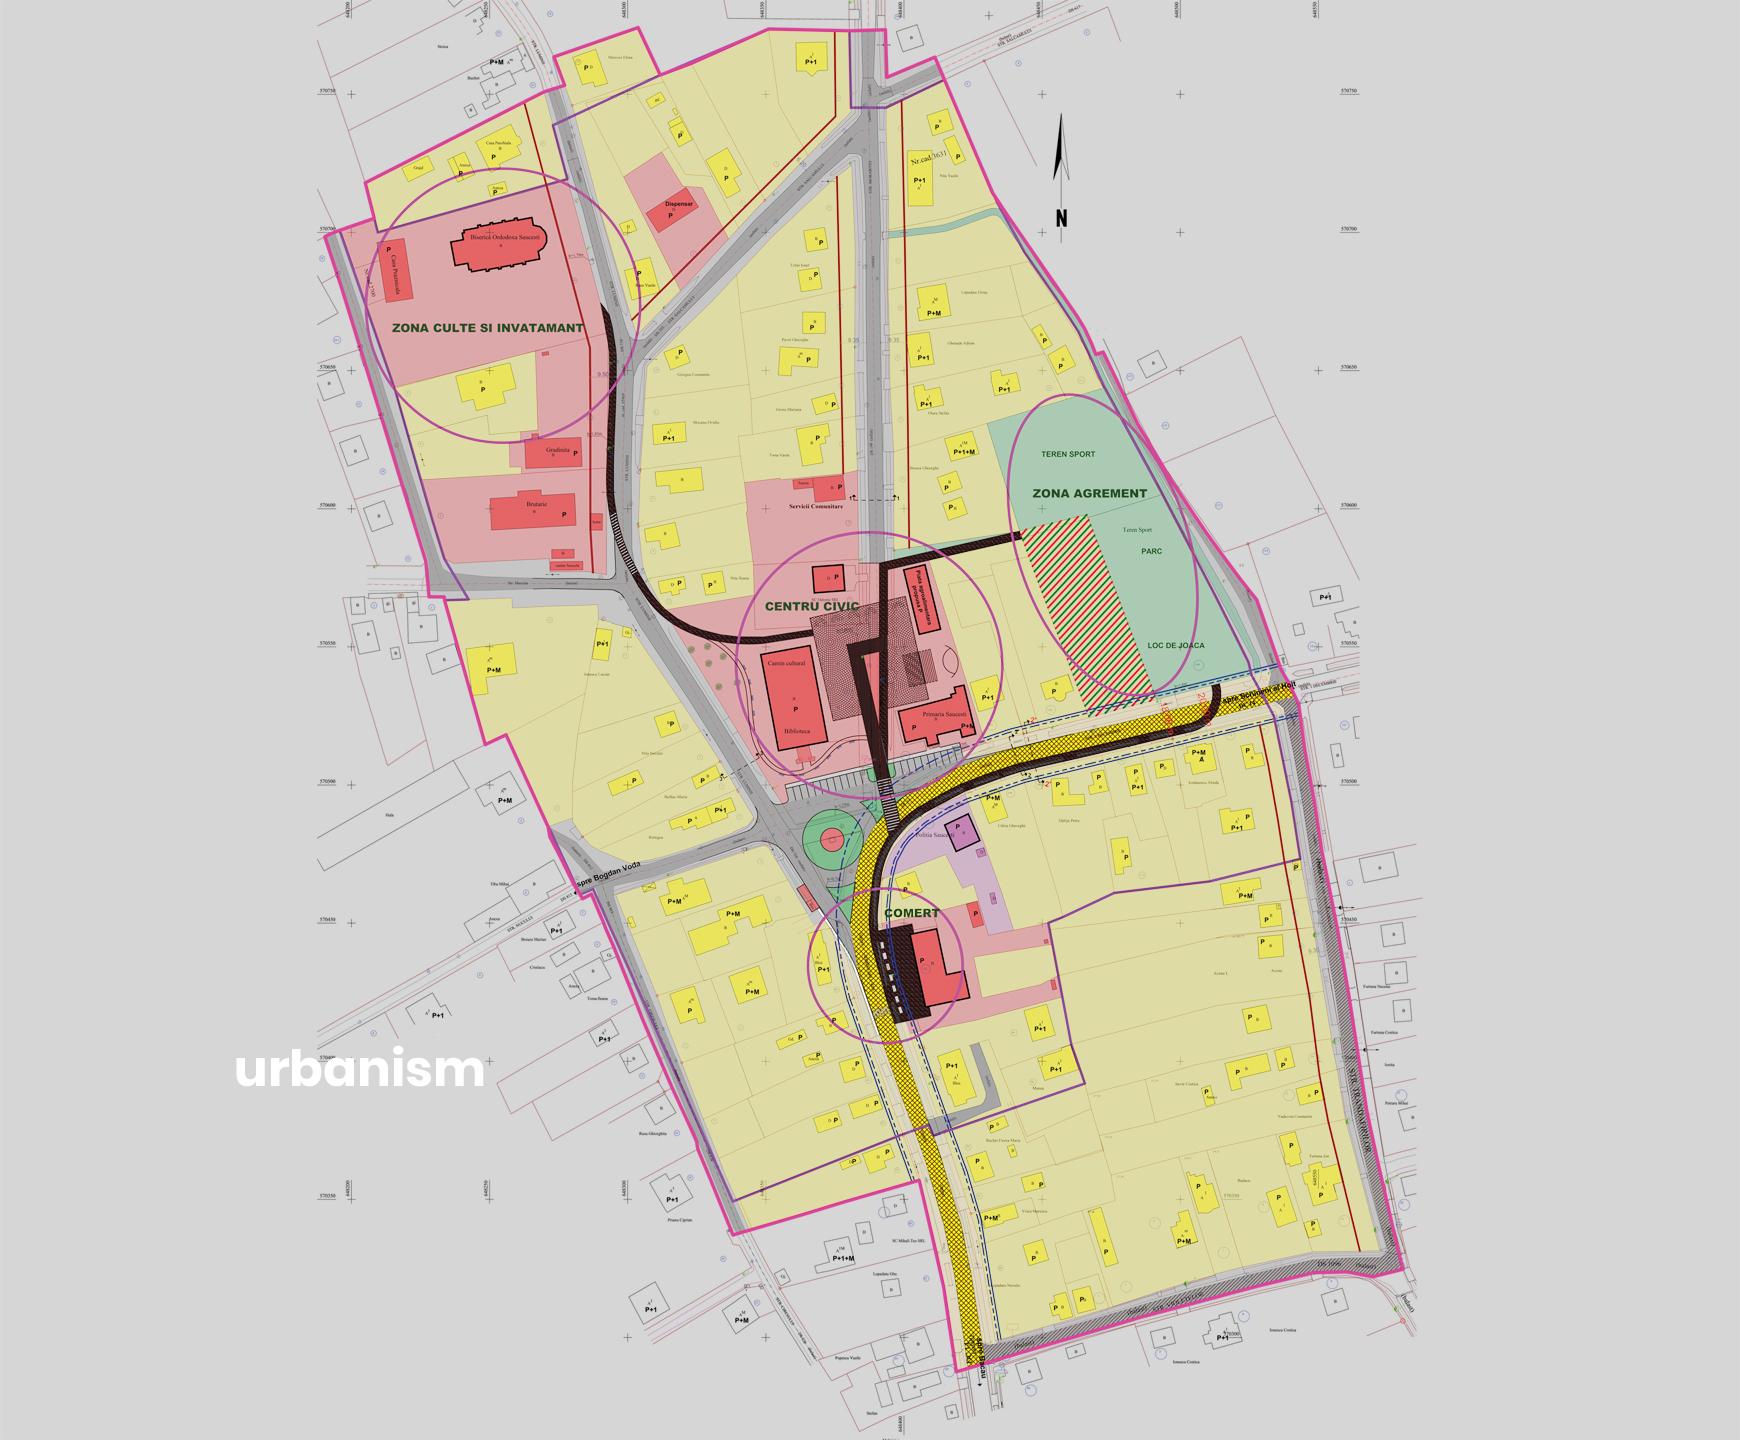 65 - urbanism